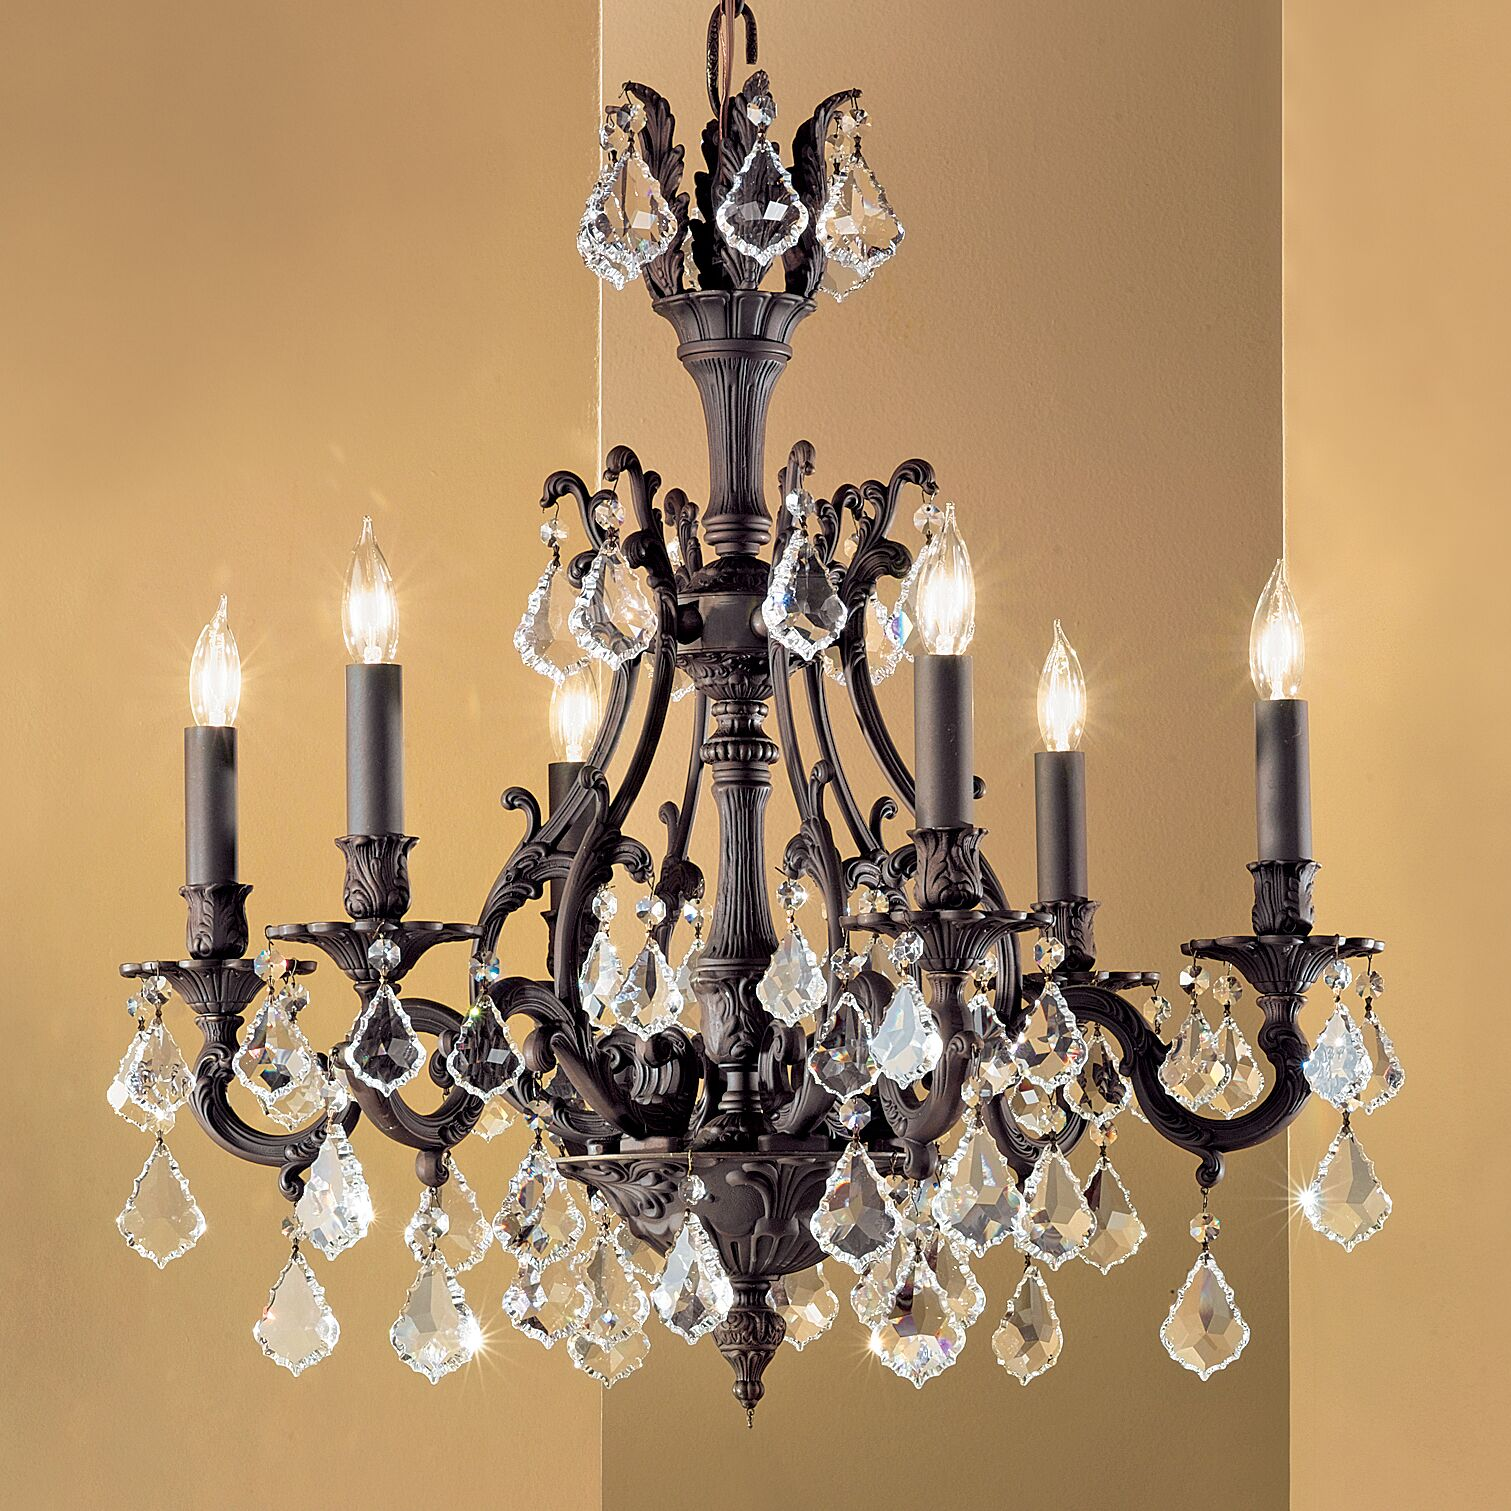 Majestic 6-Light Candle Style Chandelier Crystal Type: Swarovski Elements Golden Teak, Finish: Aged Bronze